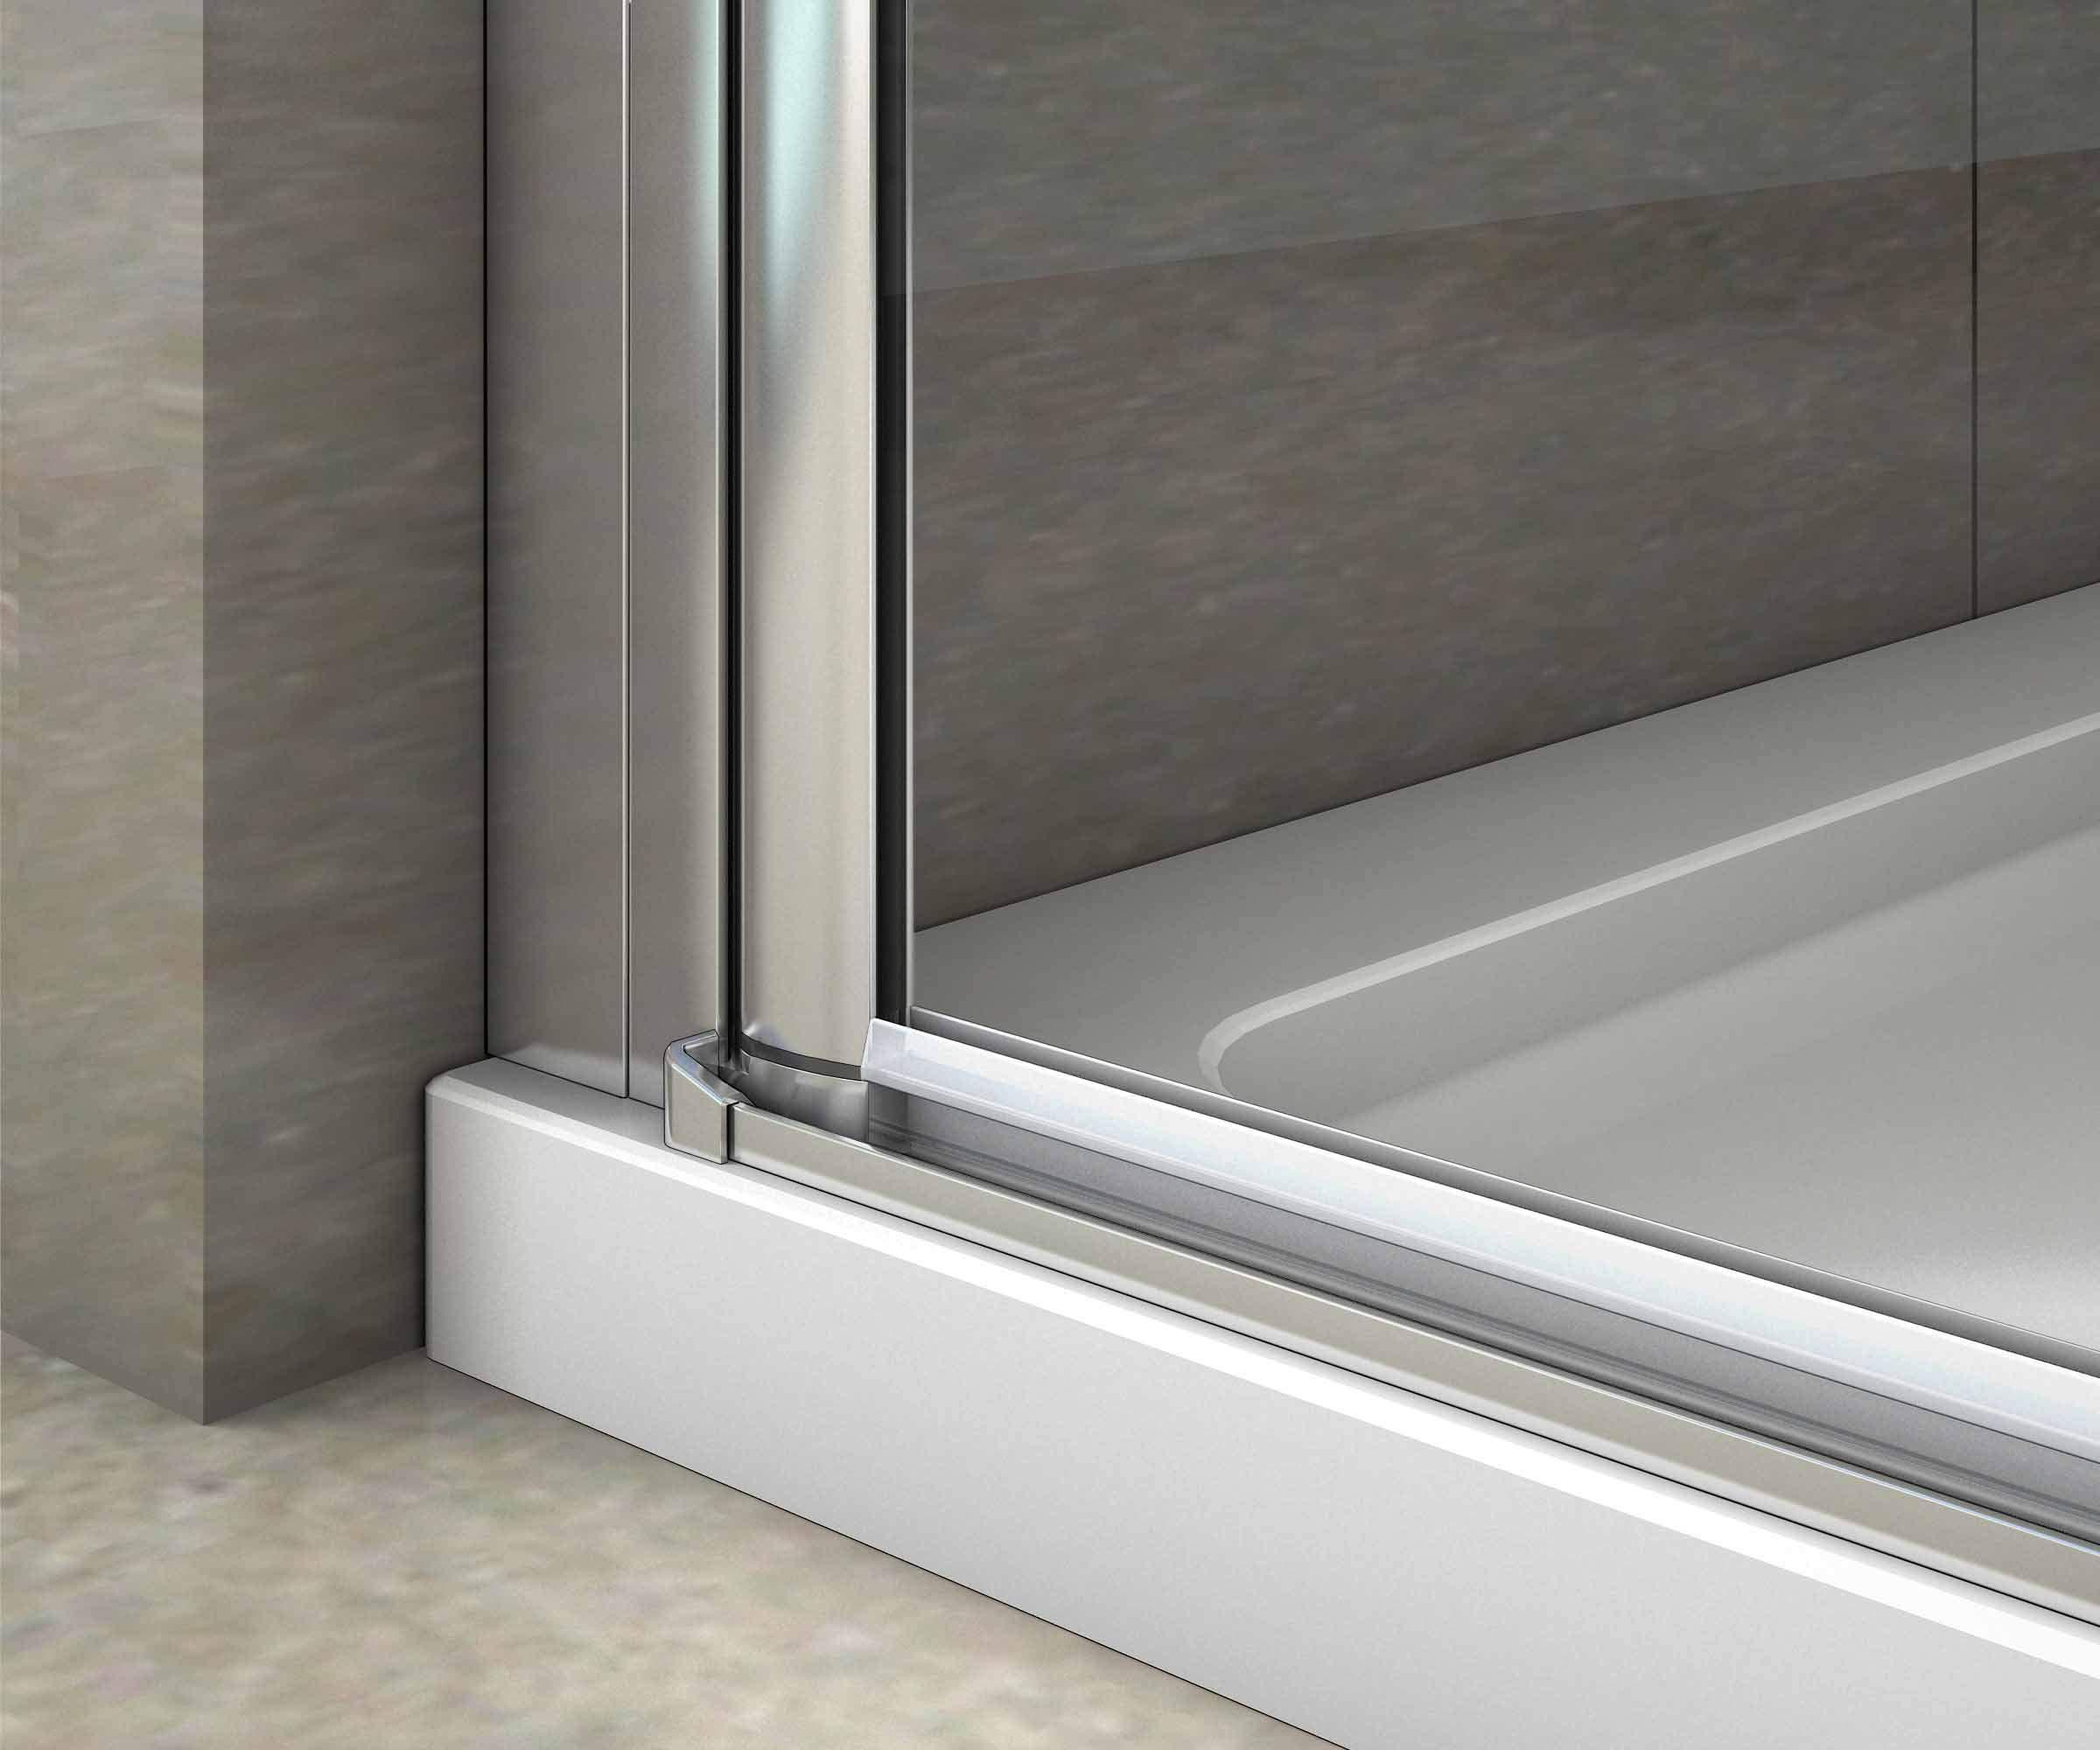 Mampara de Ducha Puerta Abatible Frontal Vidrio Nano Antical 6 MM 70x195cm